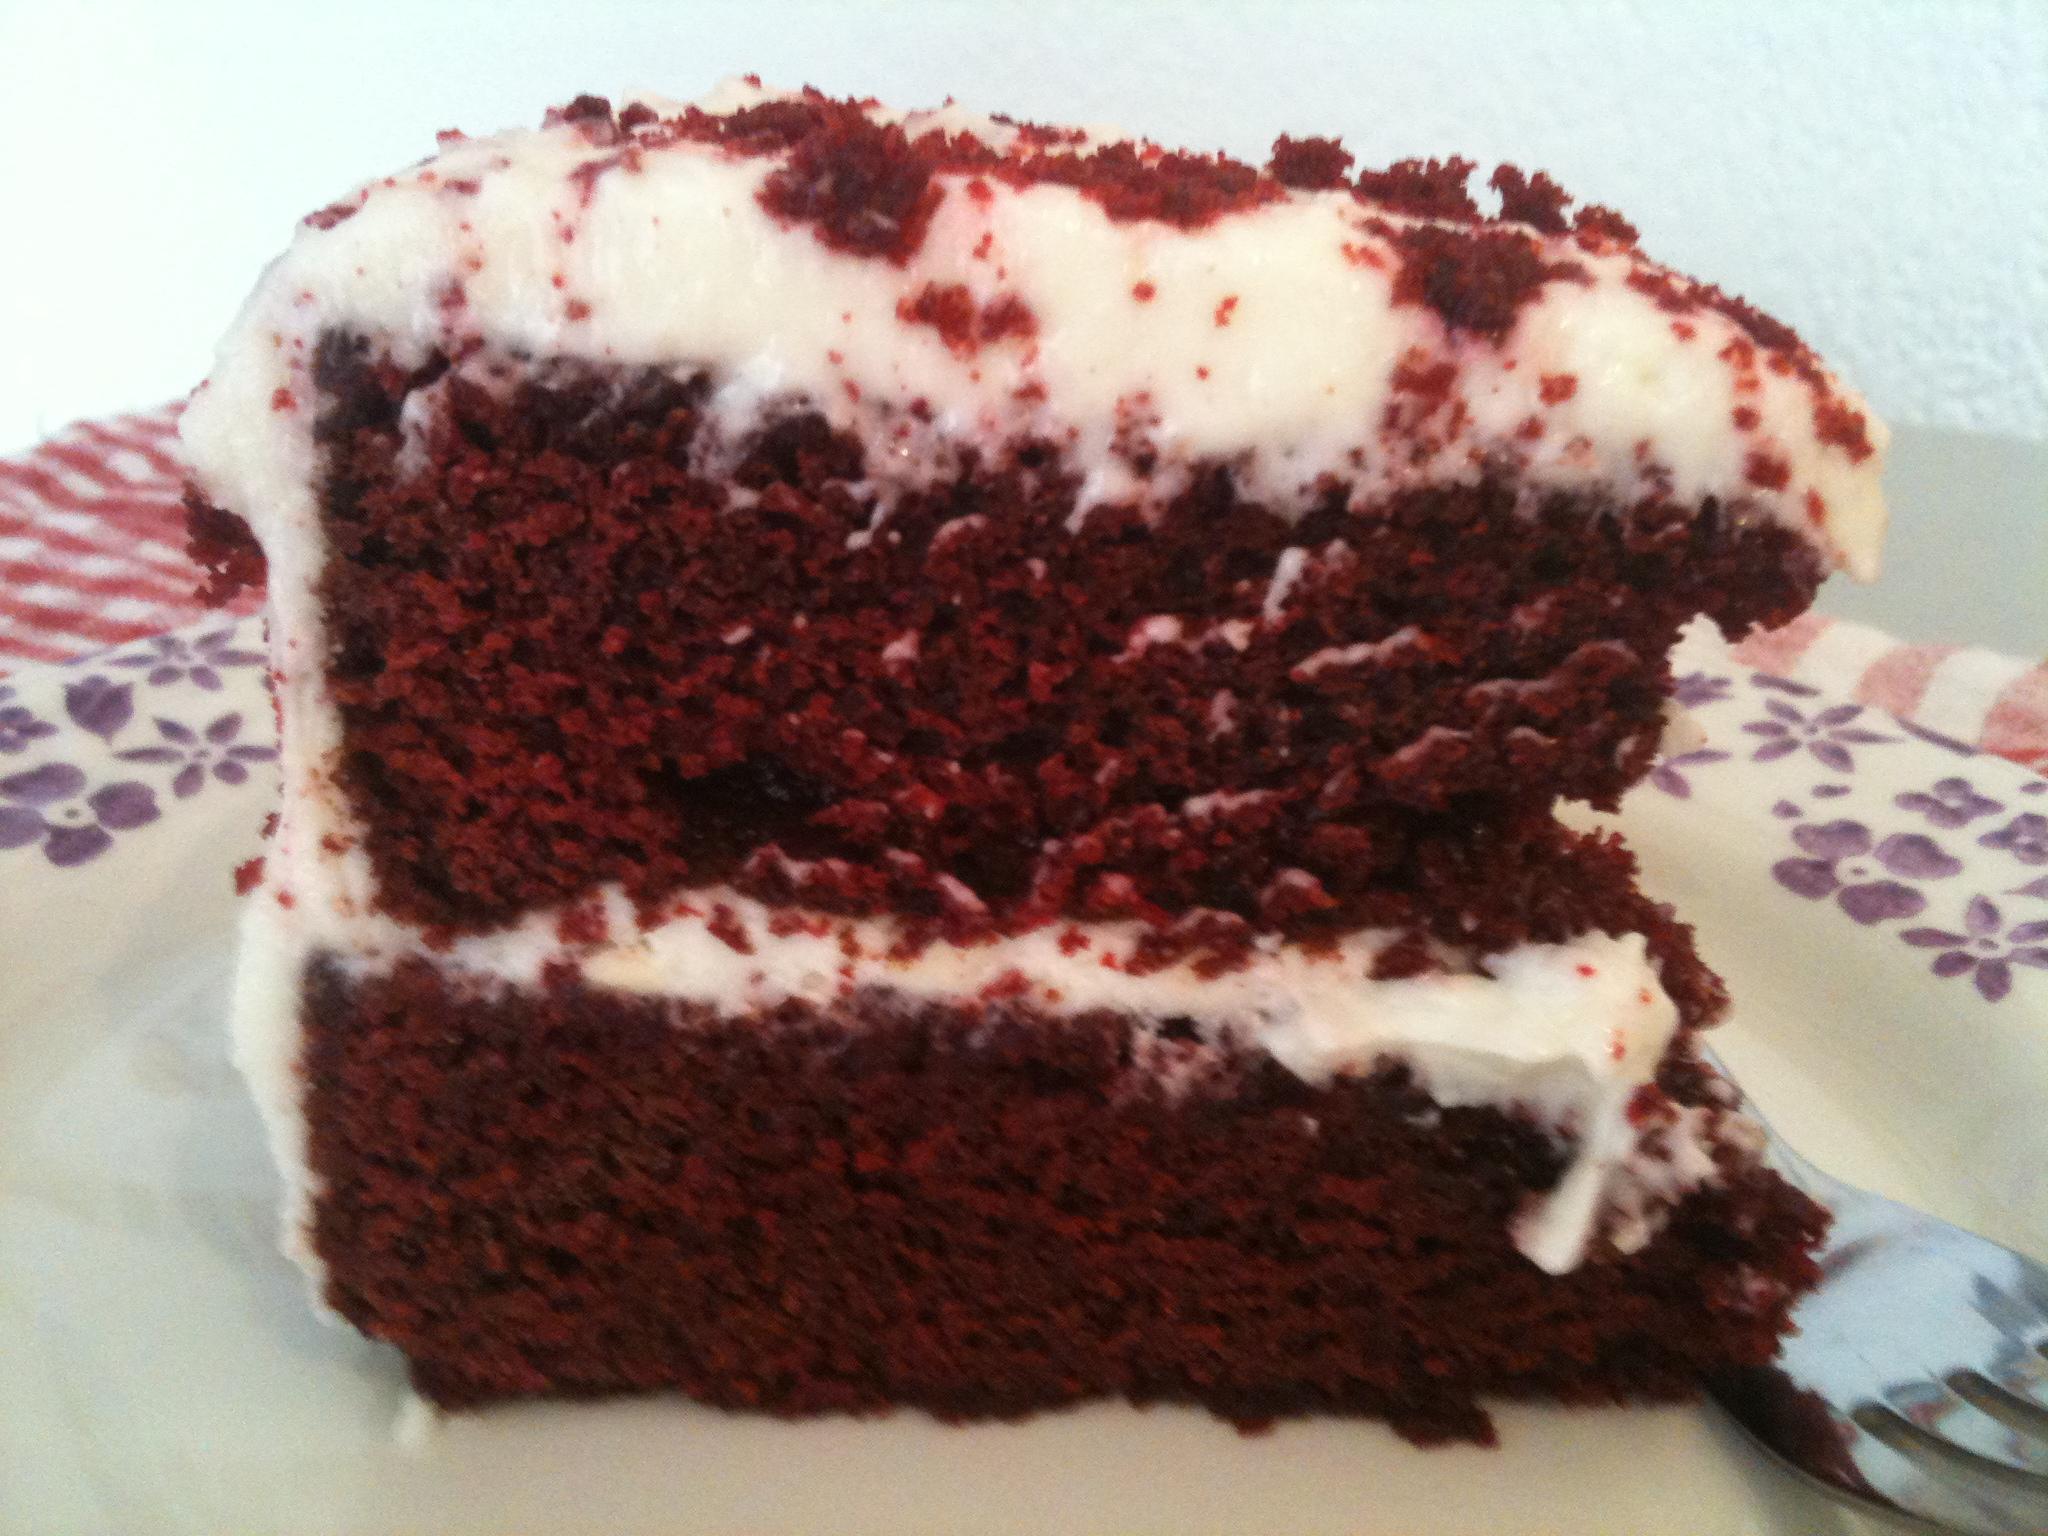 Red Velvet Cake Recept Nigella Idee D Image De Gateau